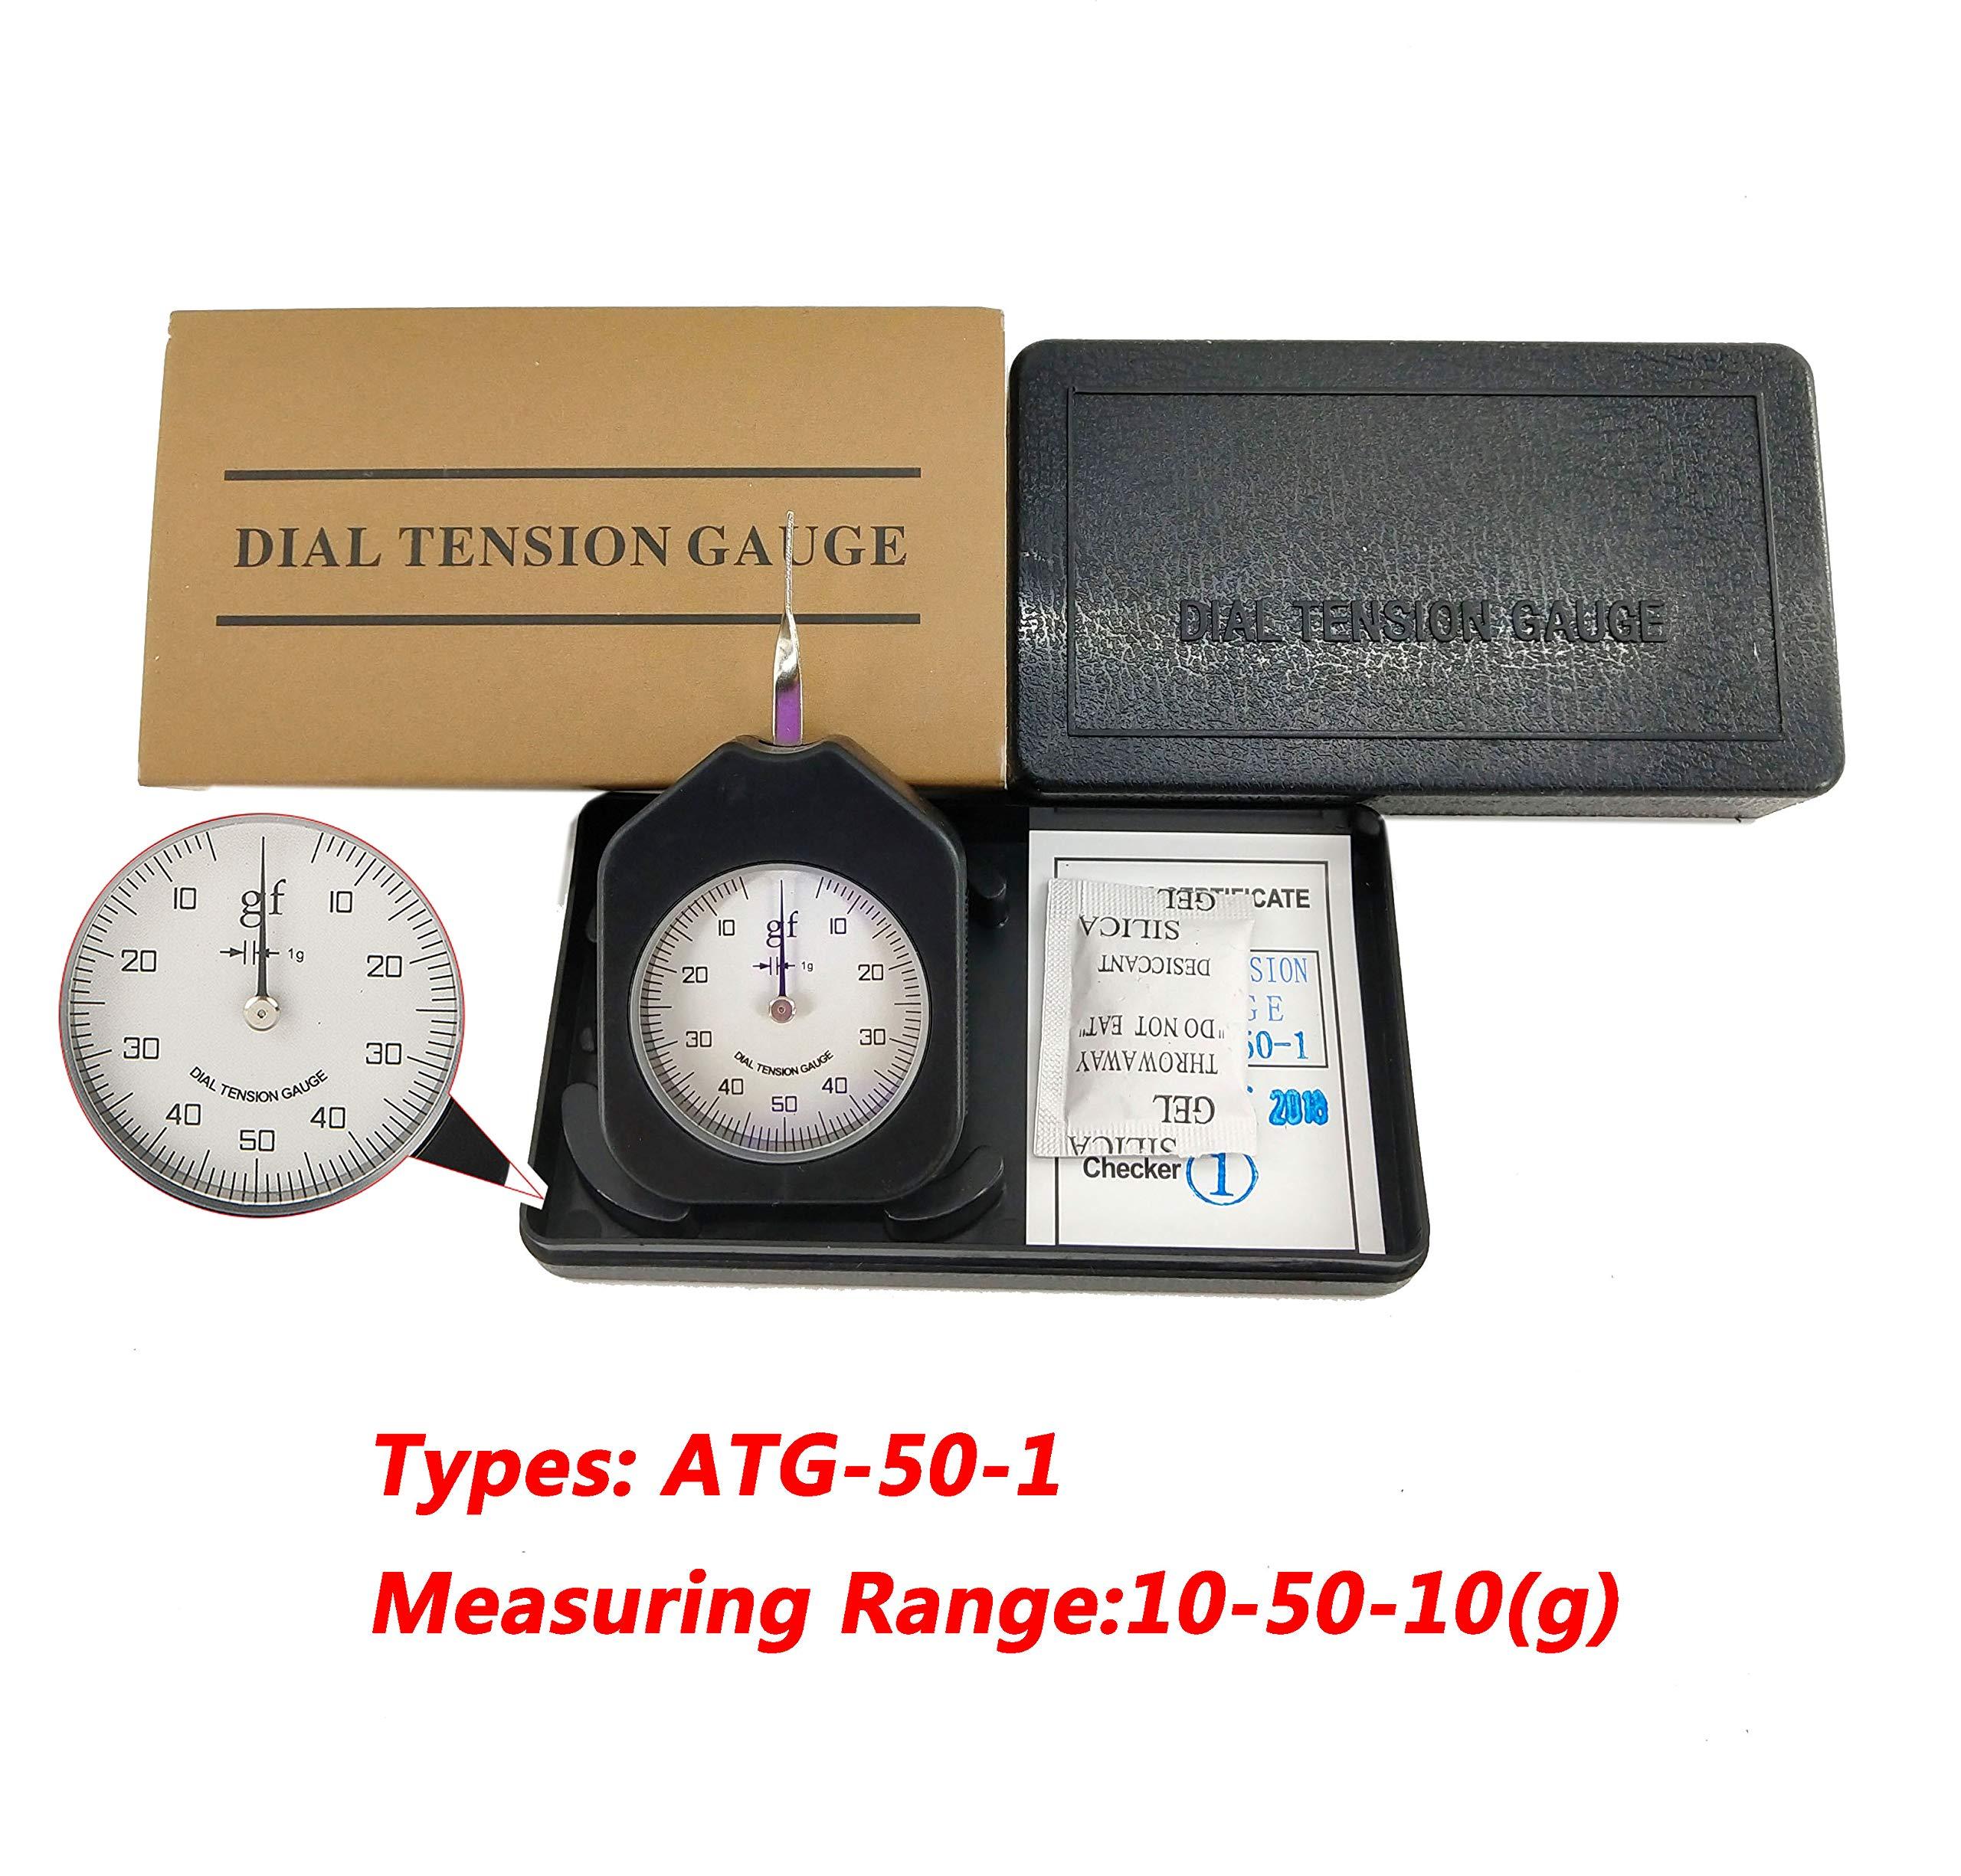 HFBTE ATG-50-1 Pocket Size Type 50g Dial Tensionmeter Tension Gauge with Single Pointer Tension Meter Tester by HFBTE